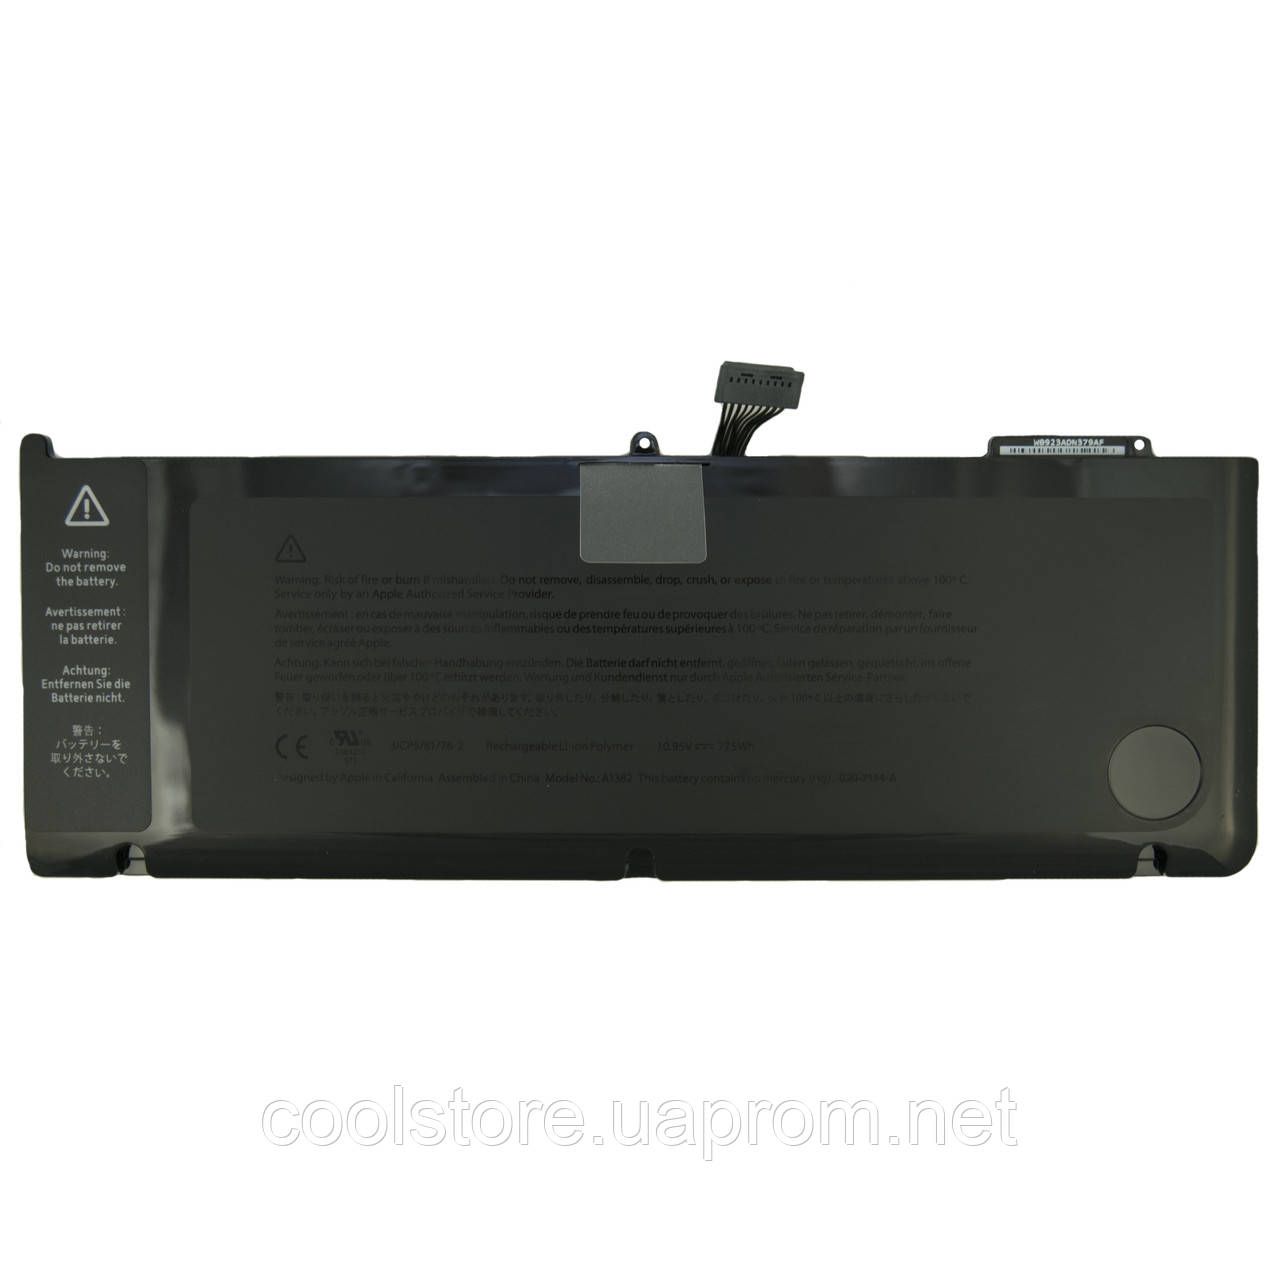 "Батарея A1382 для MacBook Pro 15"" 2011-2012гг. A1286"